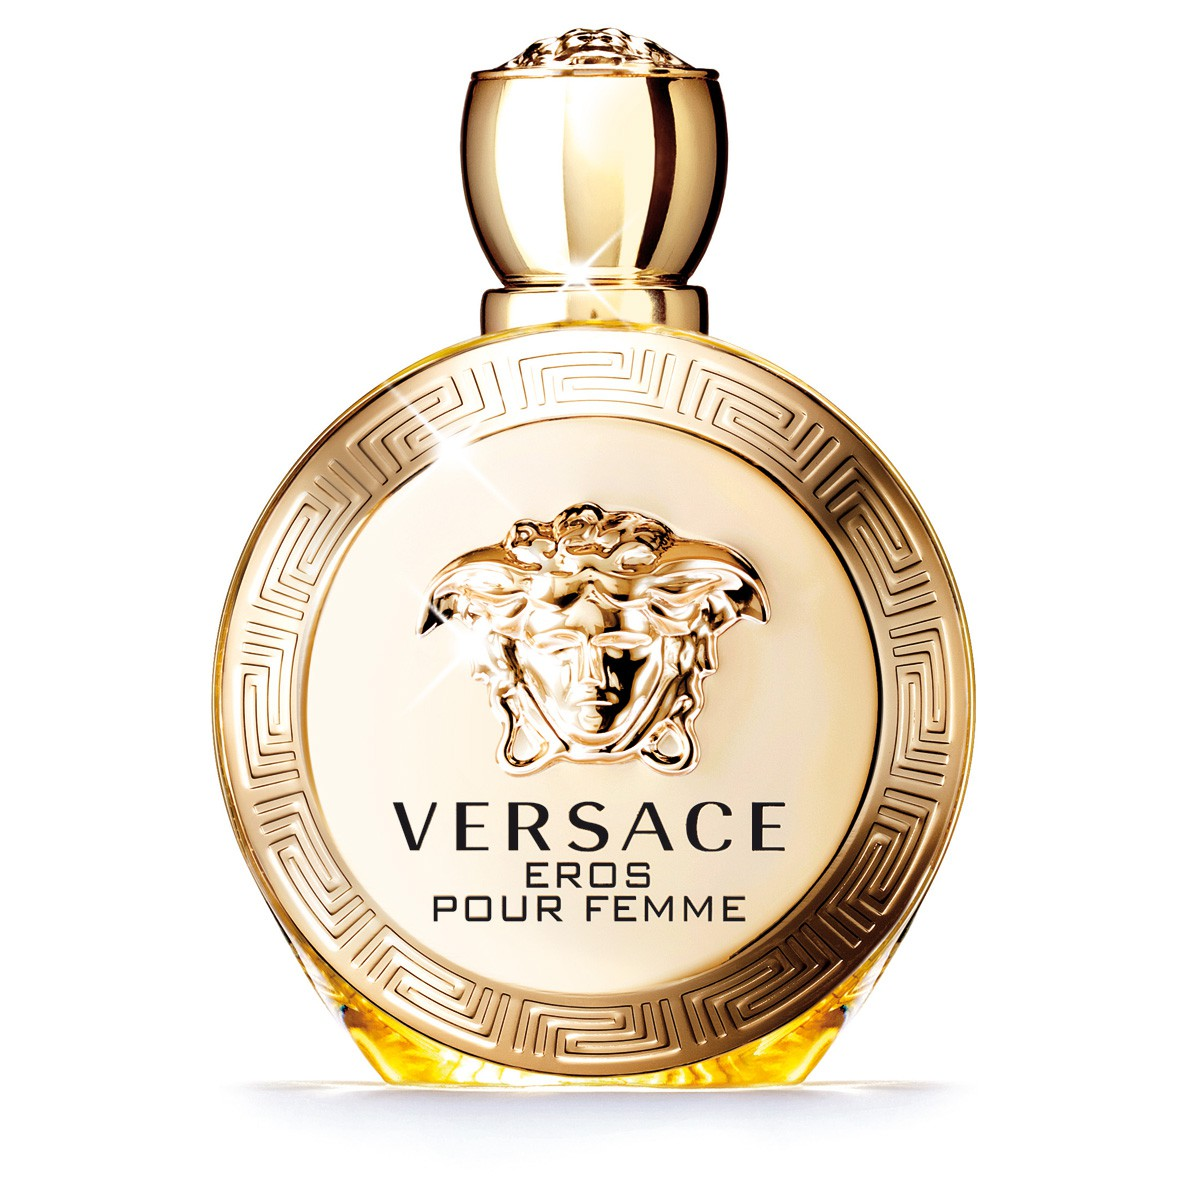 Versace Eros Pour Femme - Perfume Eau De Parfum Feminino 100ml